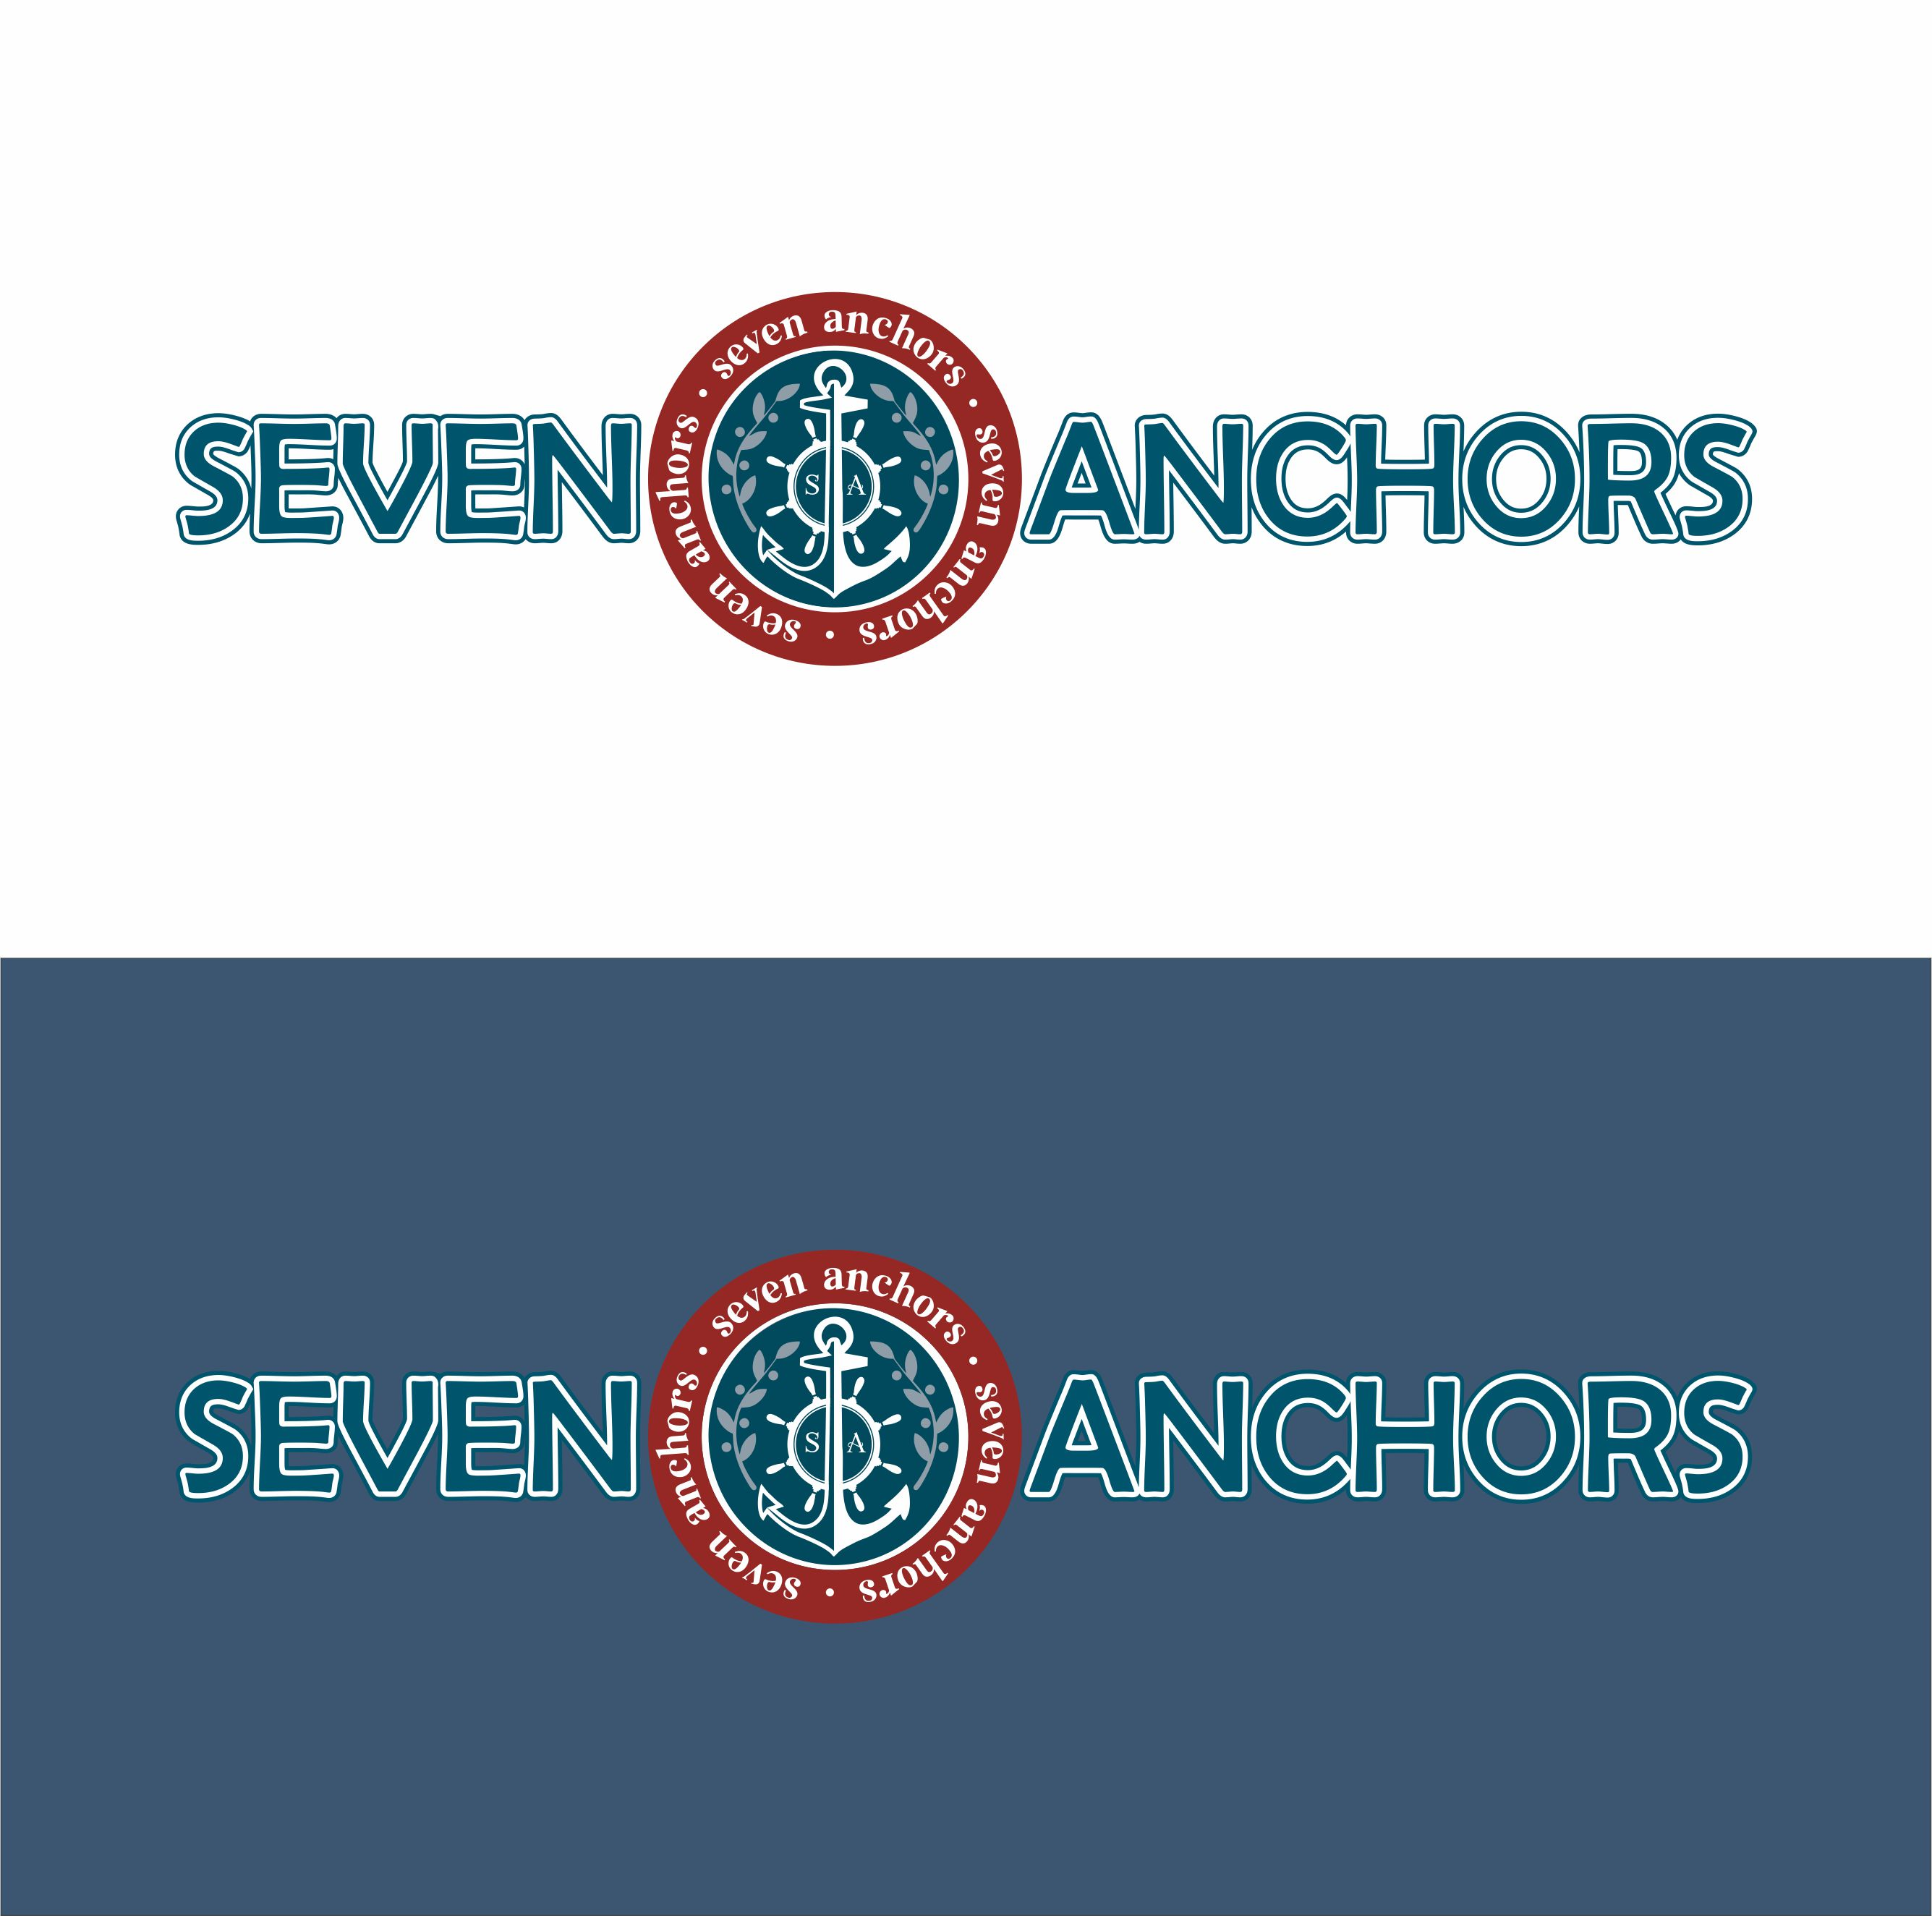 Разработка логотипа и наименования для чартерной компании  фото f_6765a85436116e9a.jpg